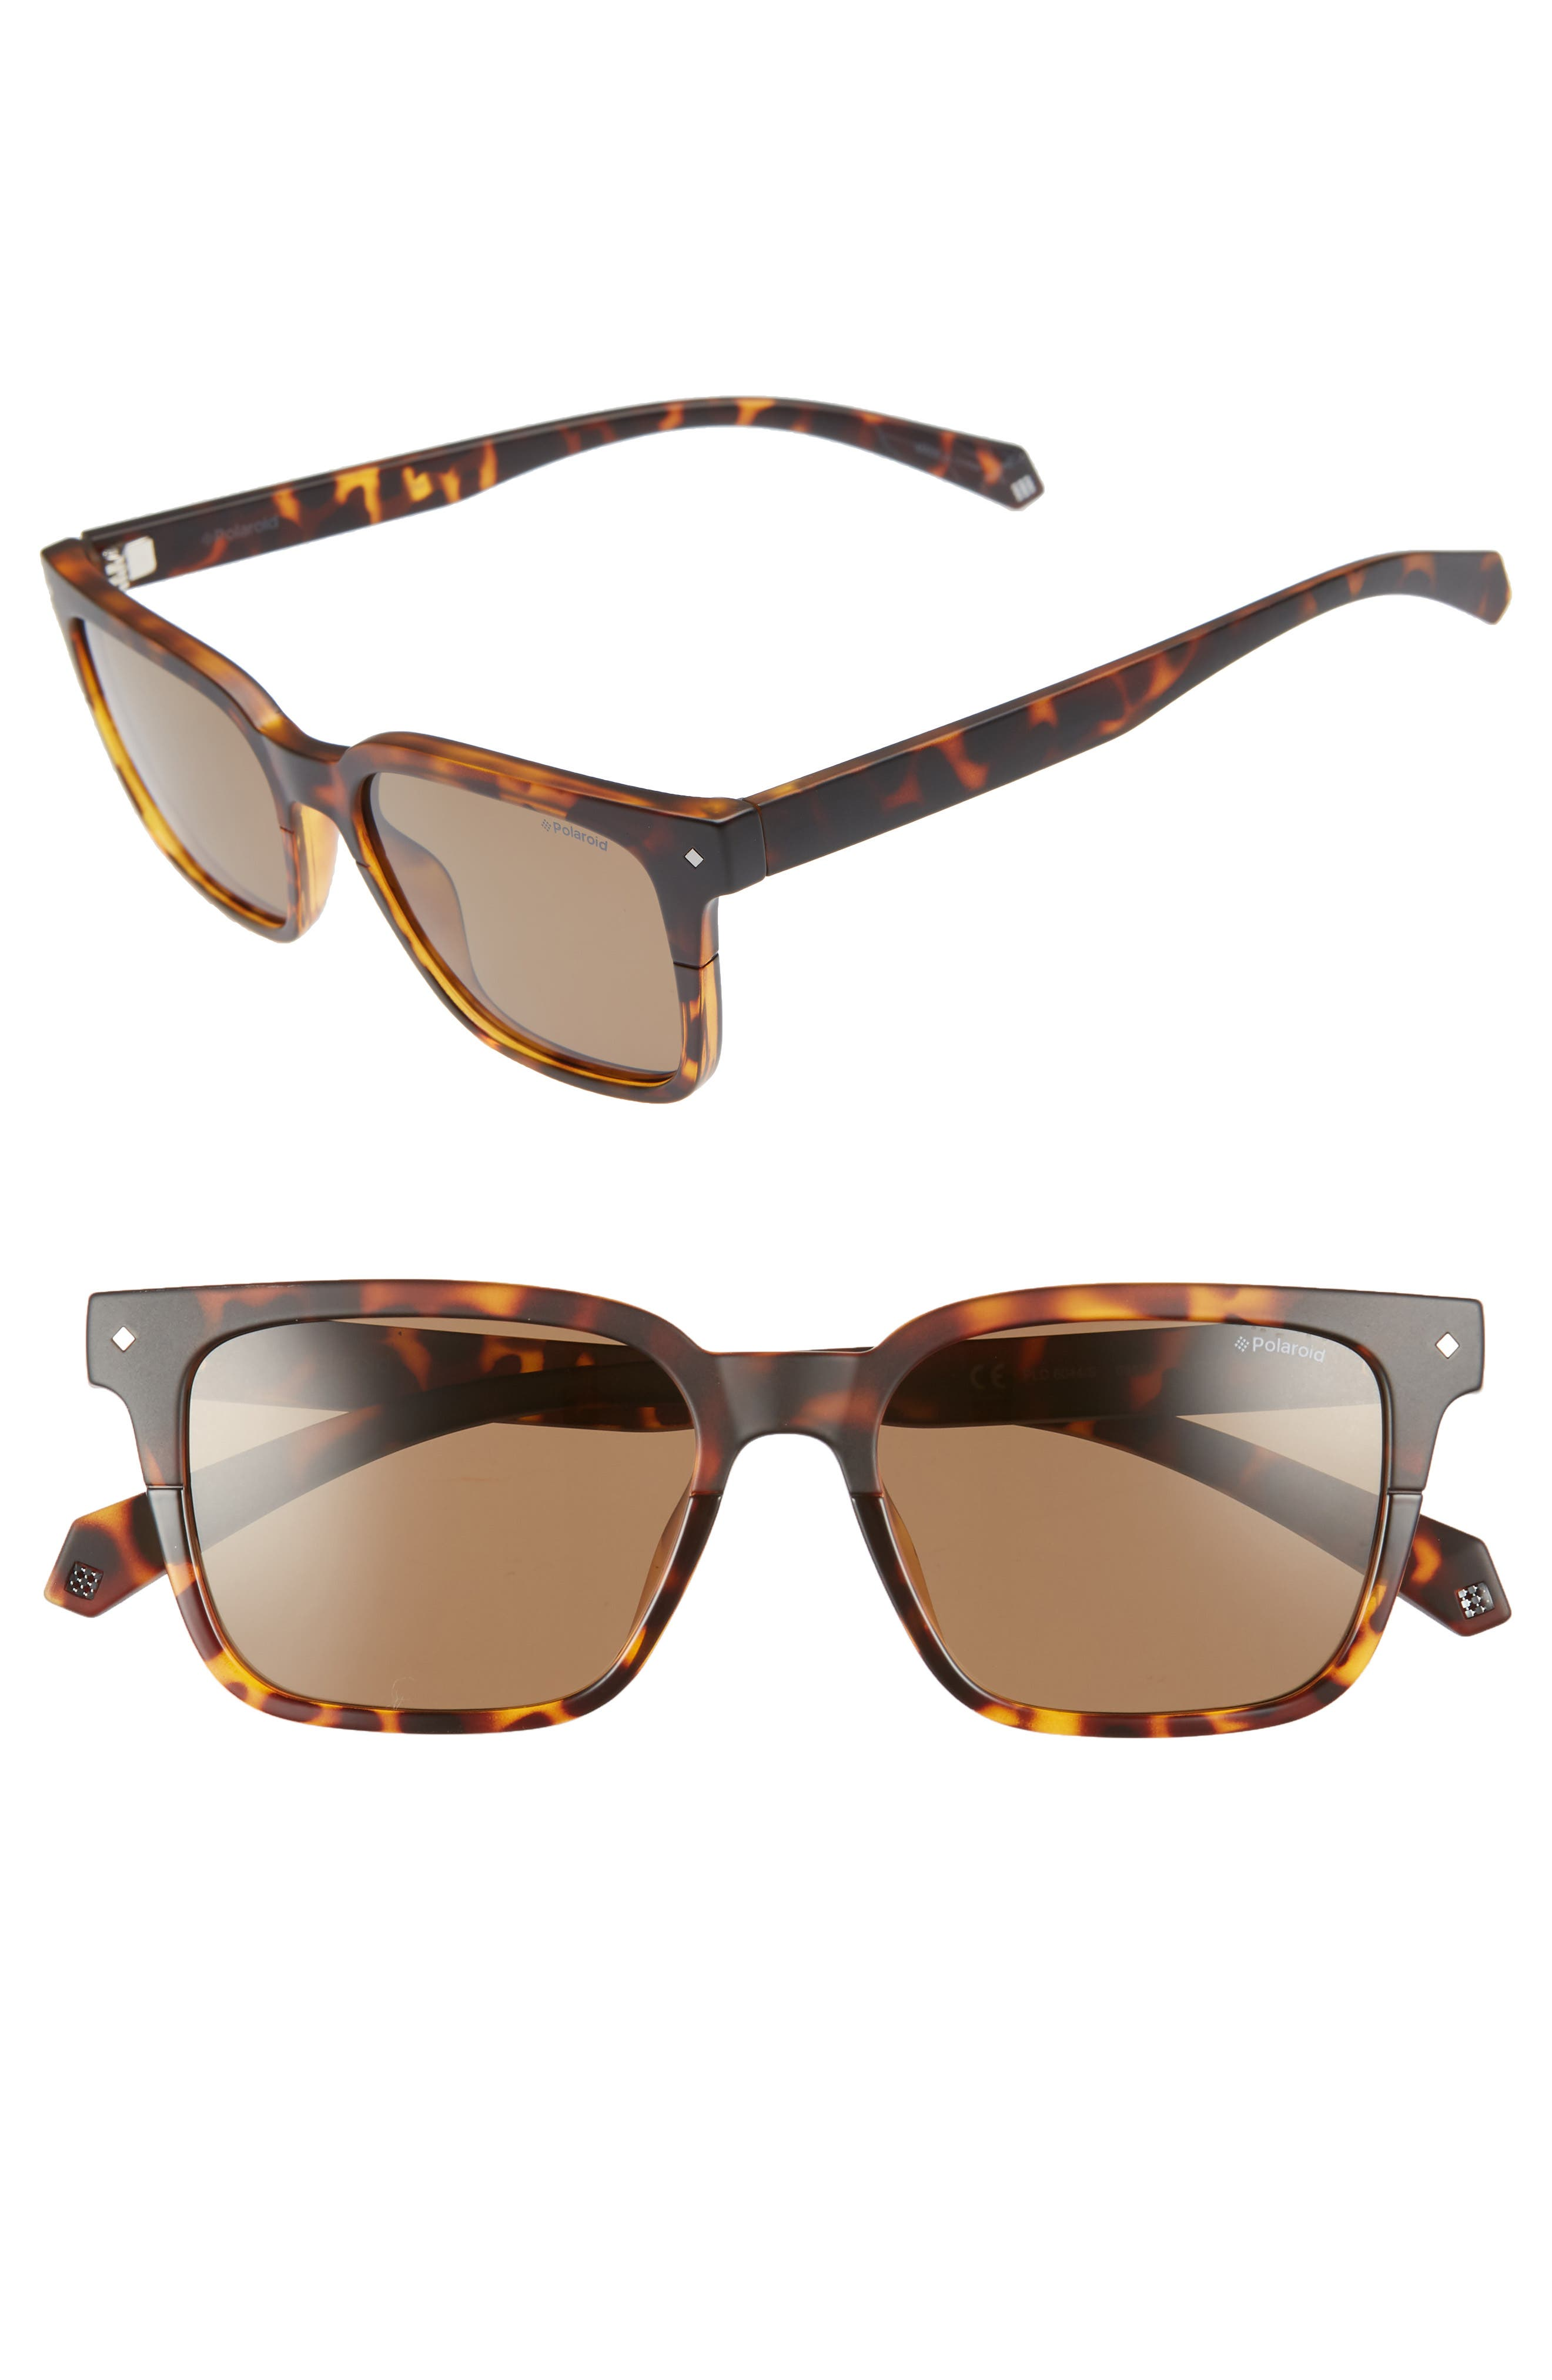 Polaroid 52Mm Polarized Sunglasses - Dark Havana